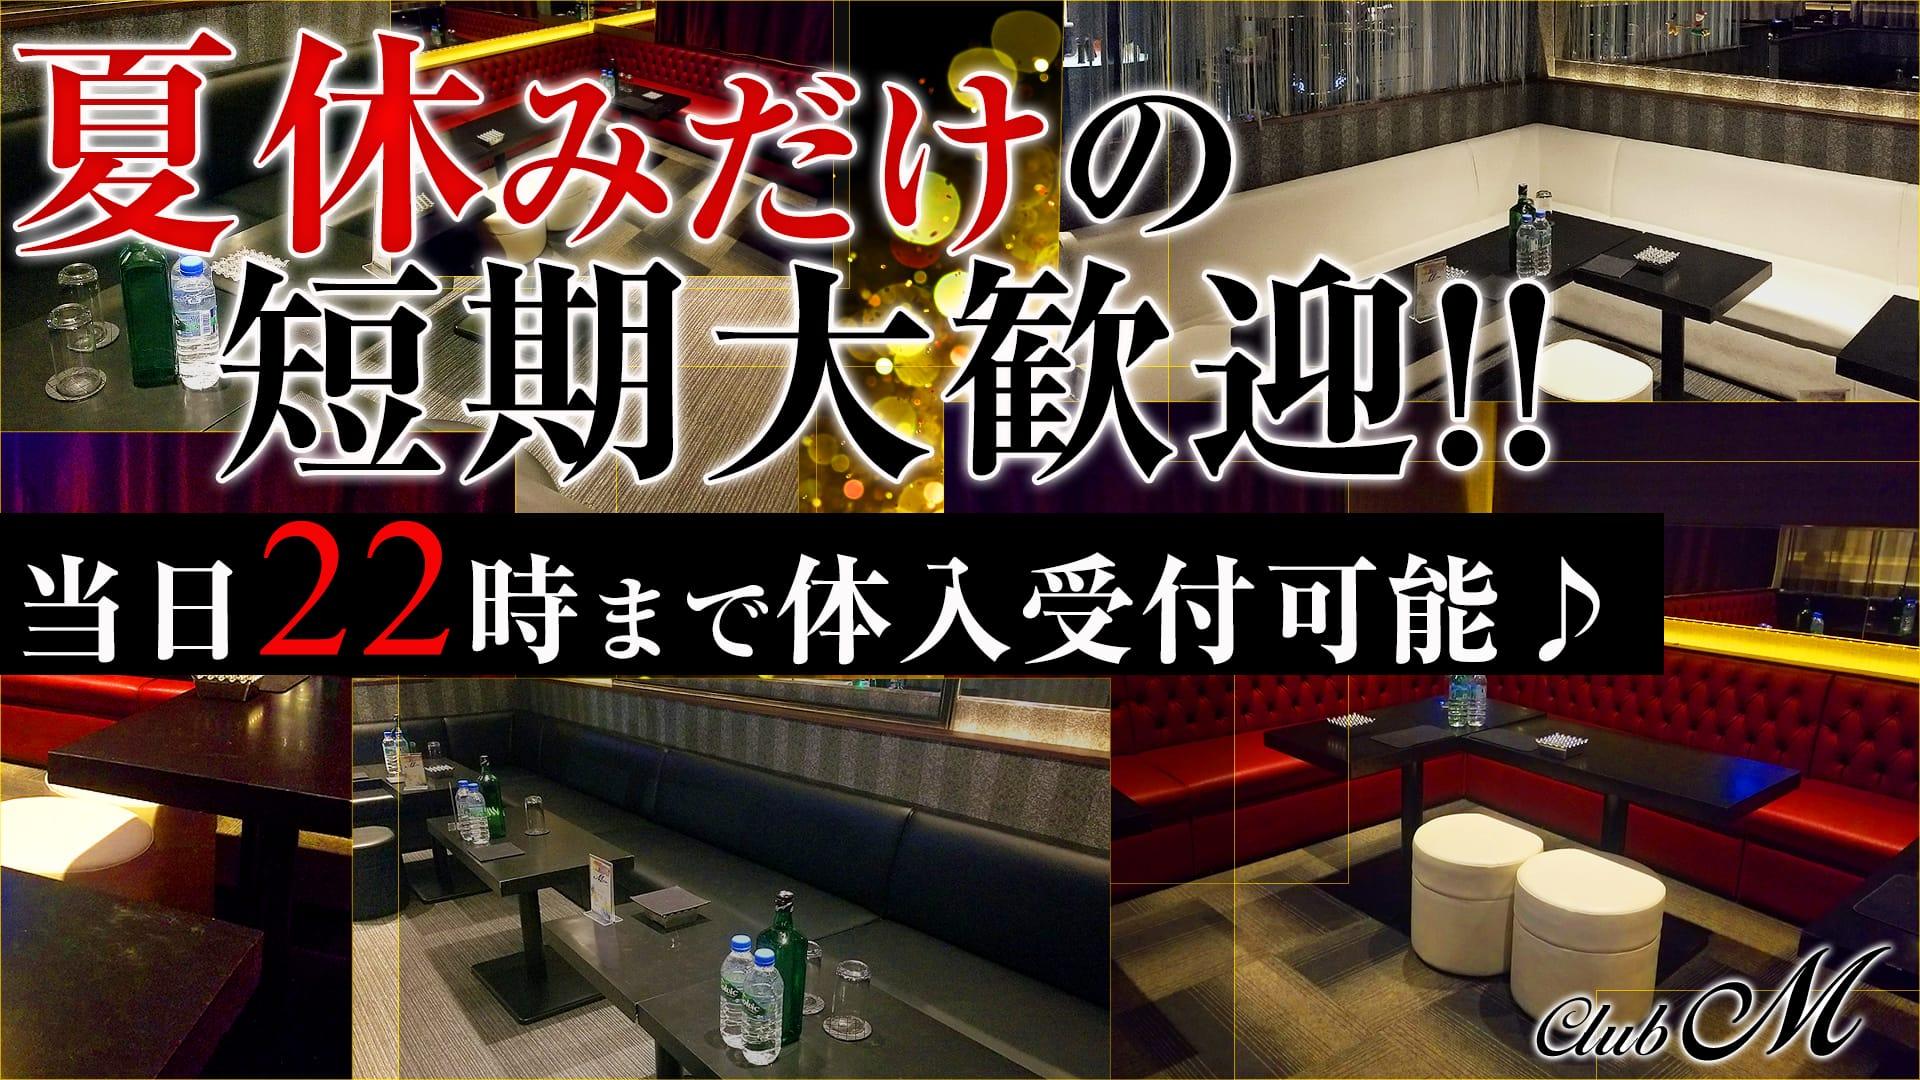 CLUB M~エム~ 錦糸町キャバクラ TOP画像